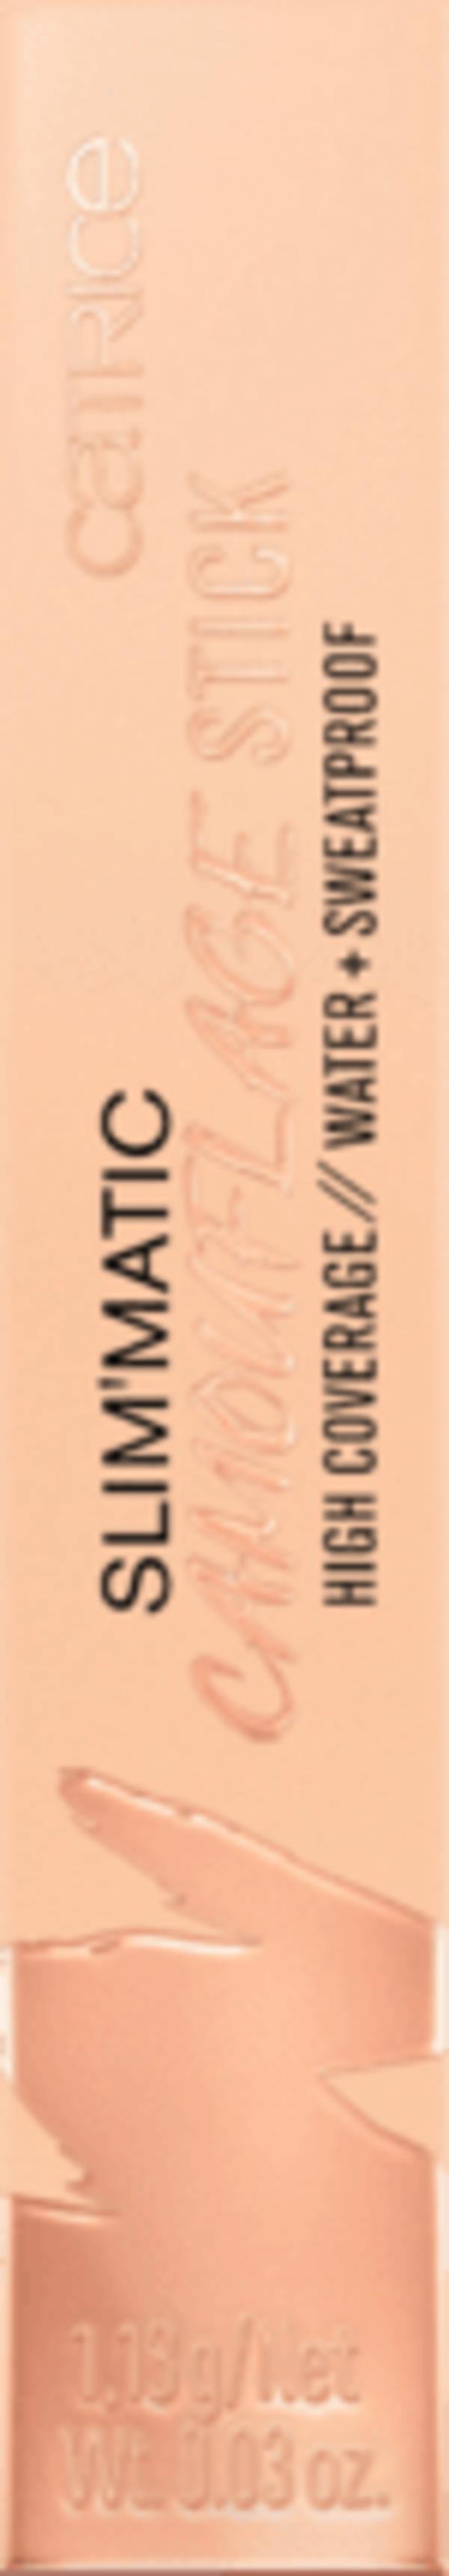 Catrice Abdeckstift Slim'matic Camouflage Stick Fair Ivory 005